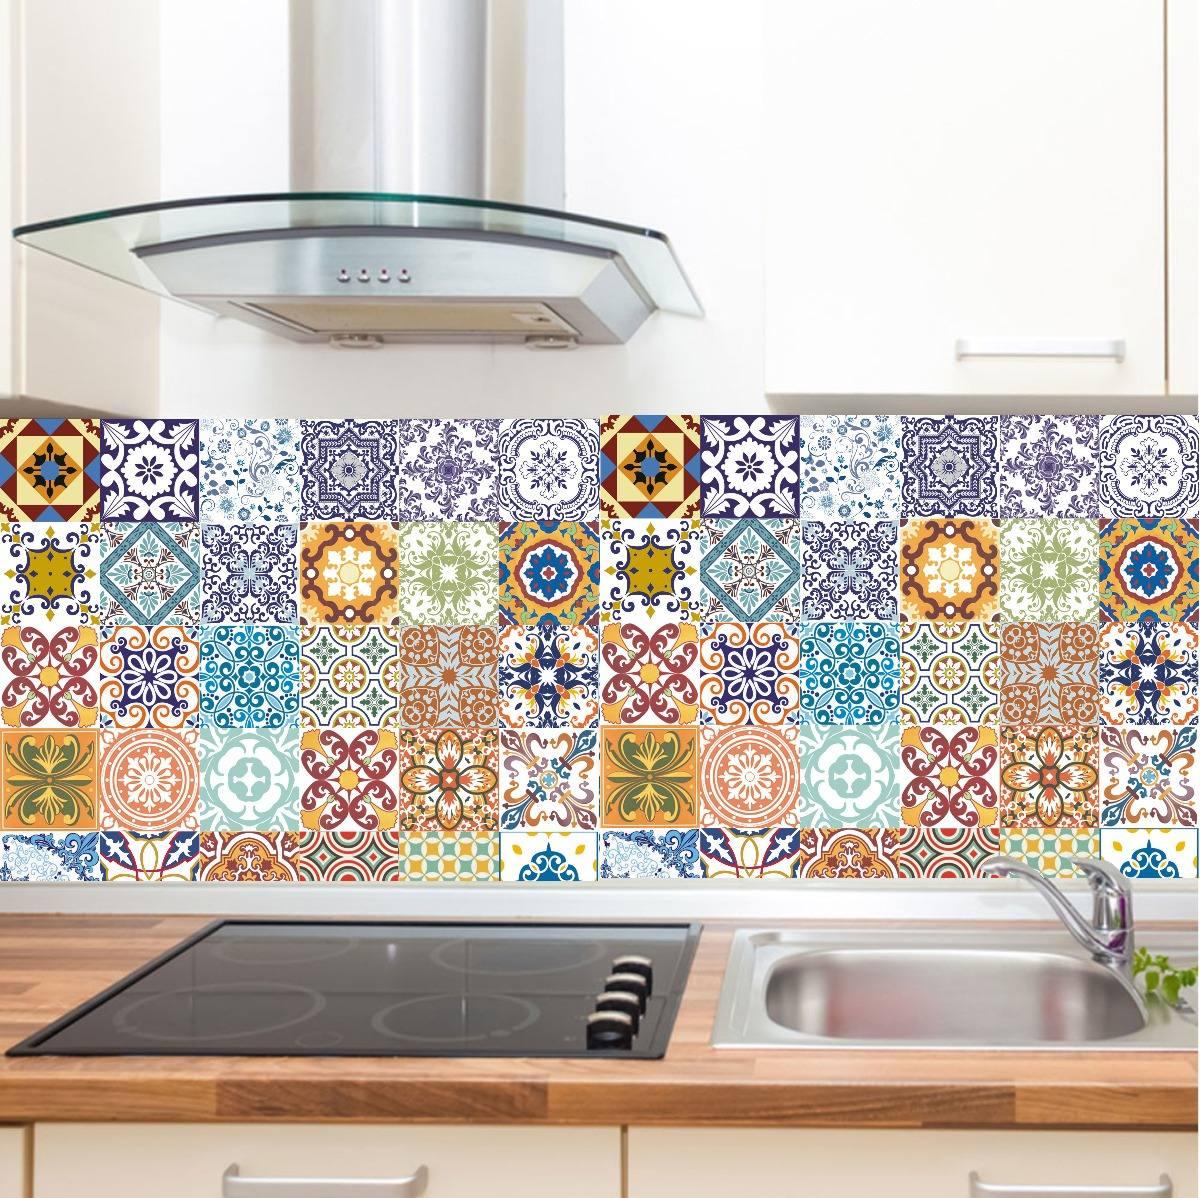 Aparador Kd Moveis ~ Adesivo Azulejo Ladrílho Hidráulico Retro Cozinha R$ 24